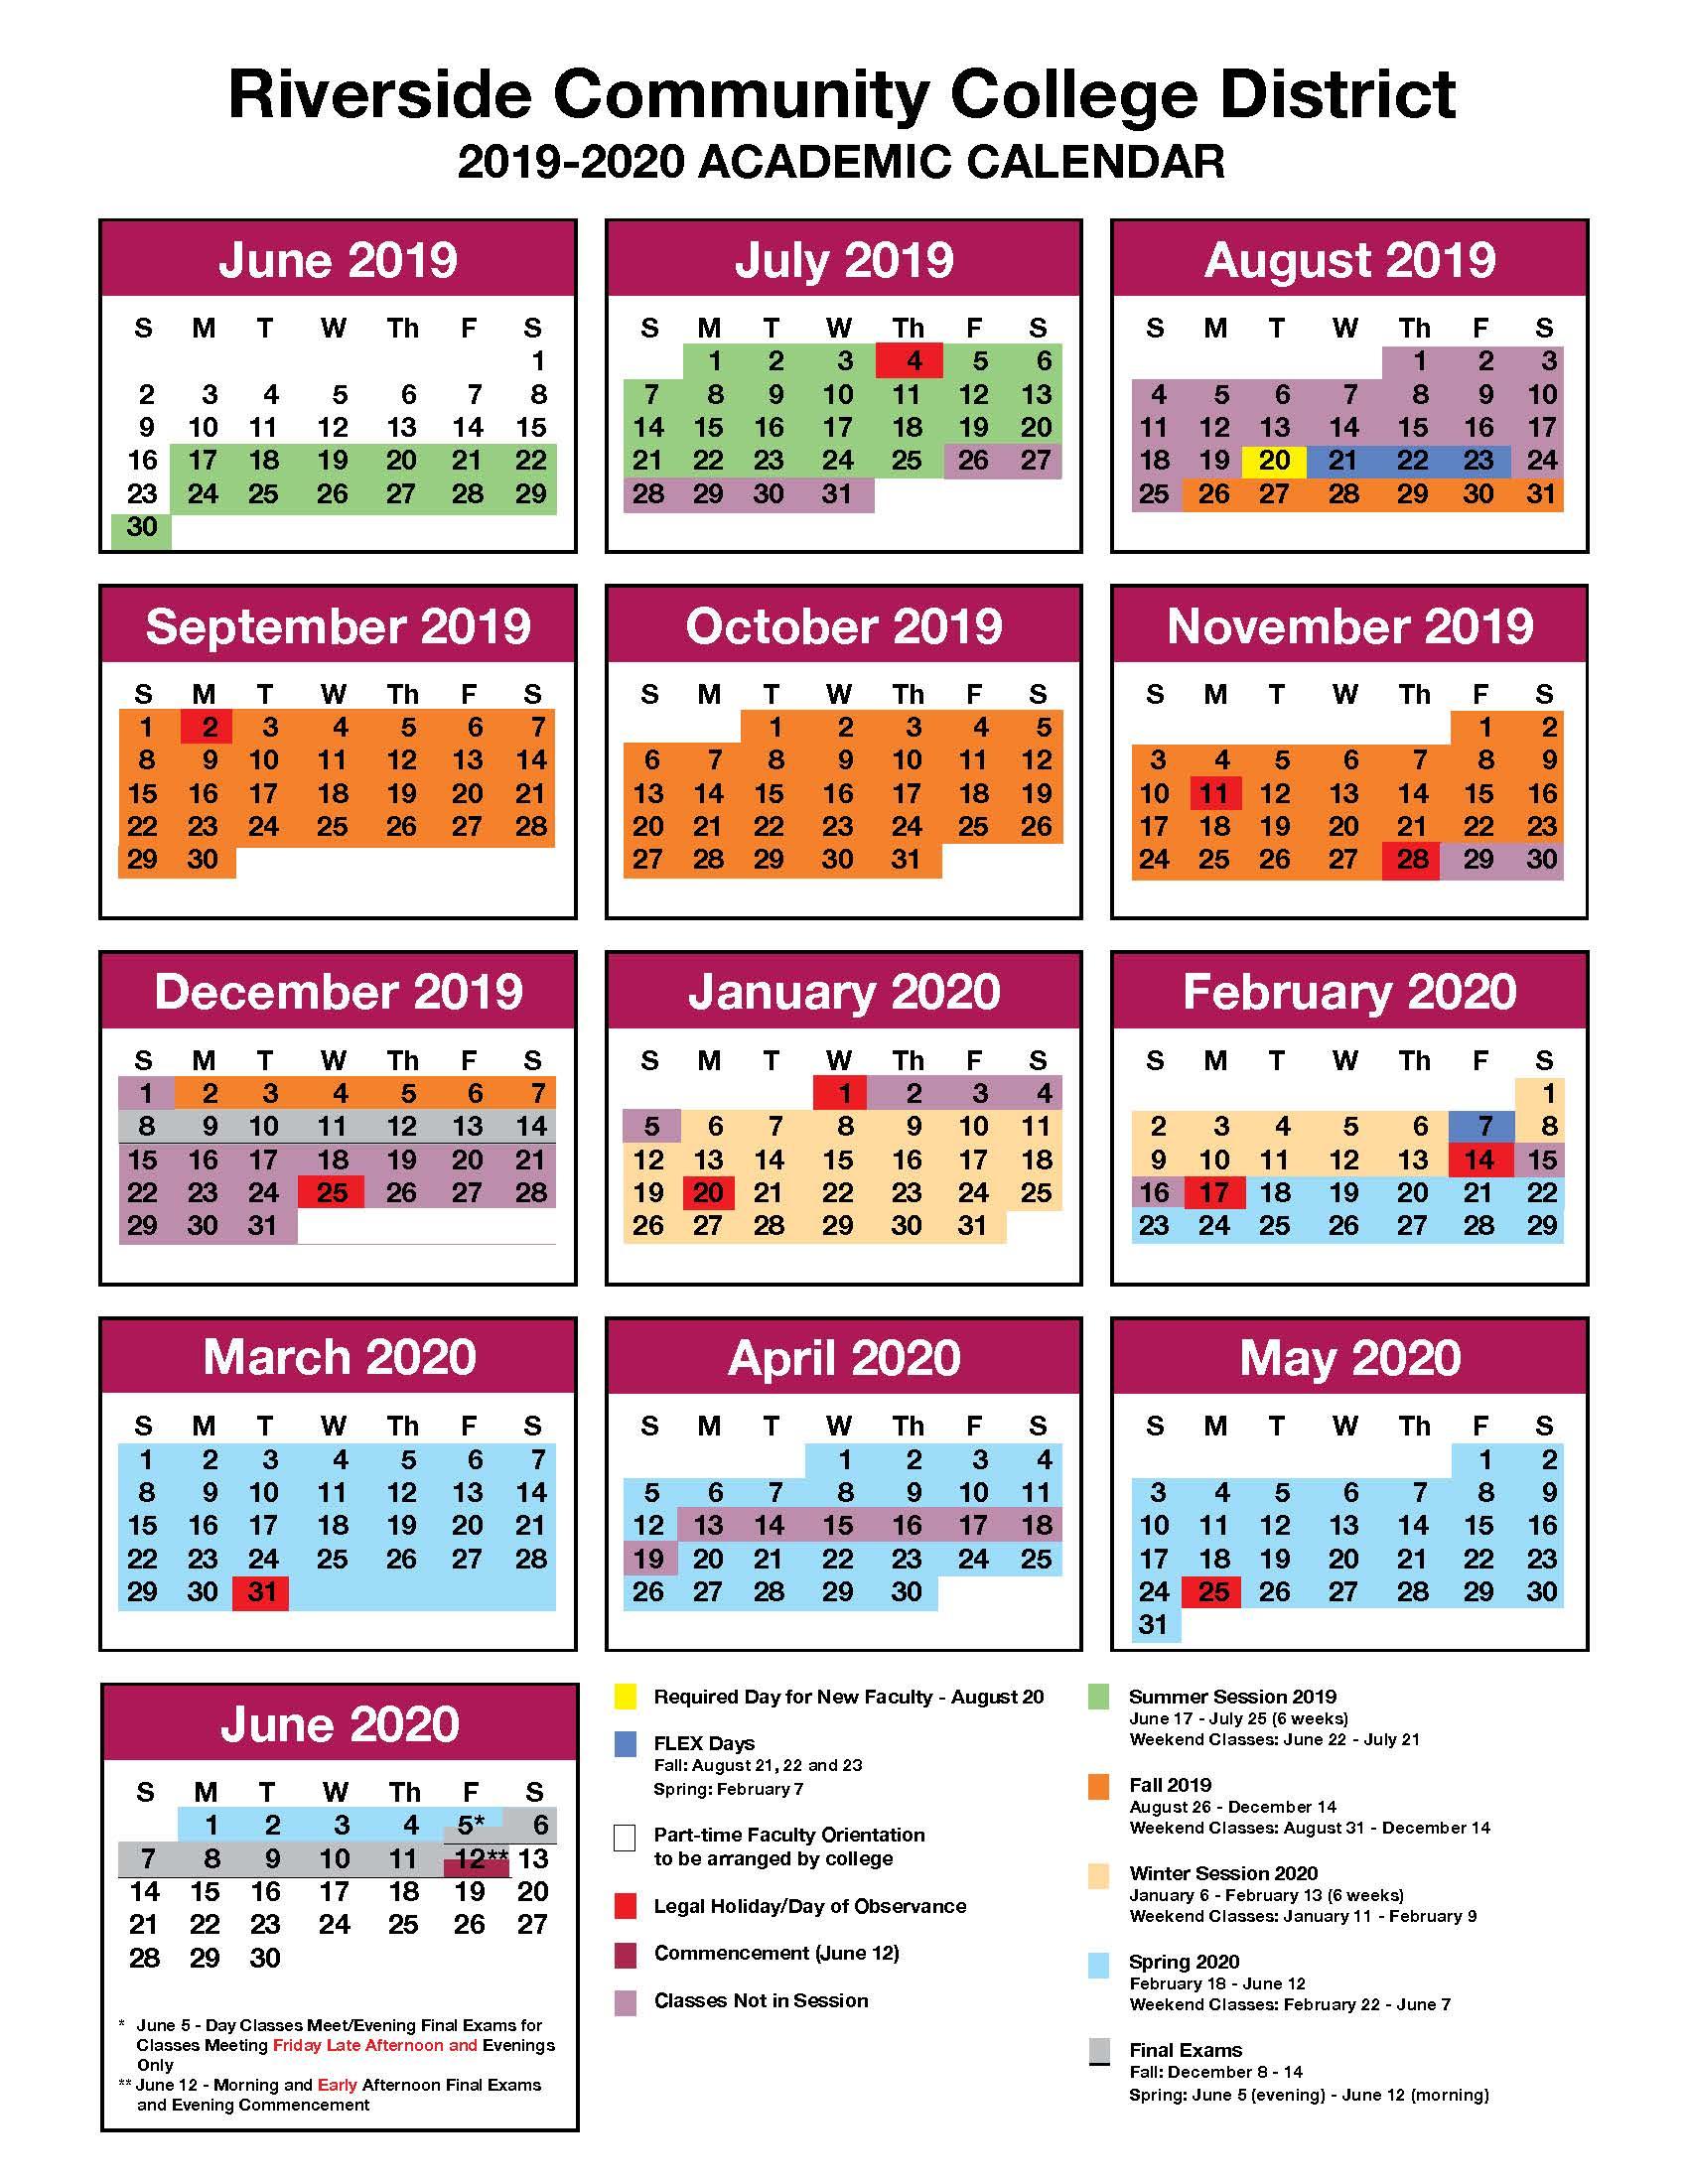 Jfk And Norco College Calendar 2019 2020 - John F. Kennedy Regarding Burbank Unified School District Calendar 2021